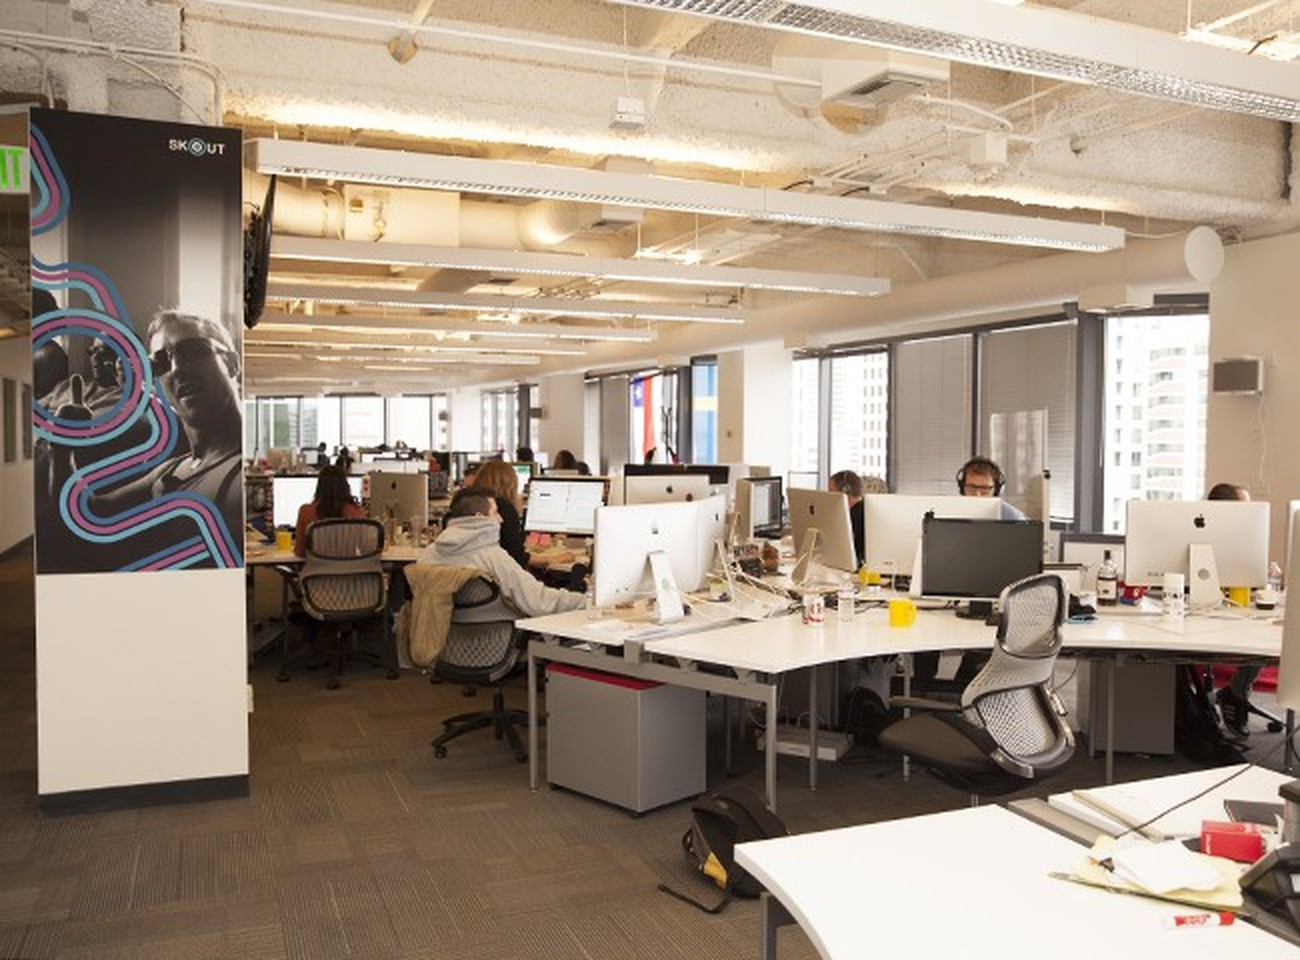 Our Office Skout Careers We Work In San Francisco